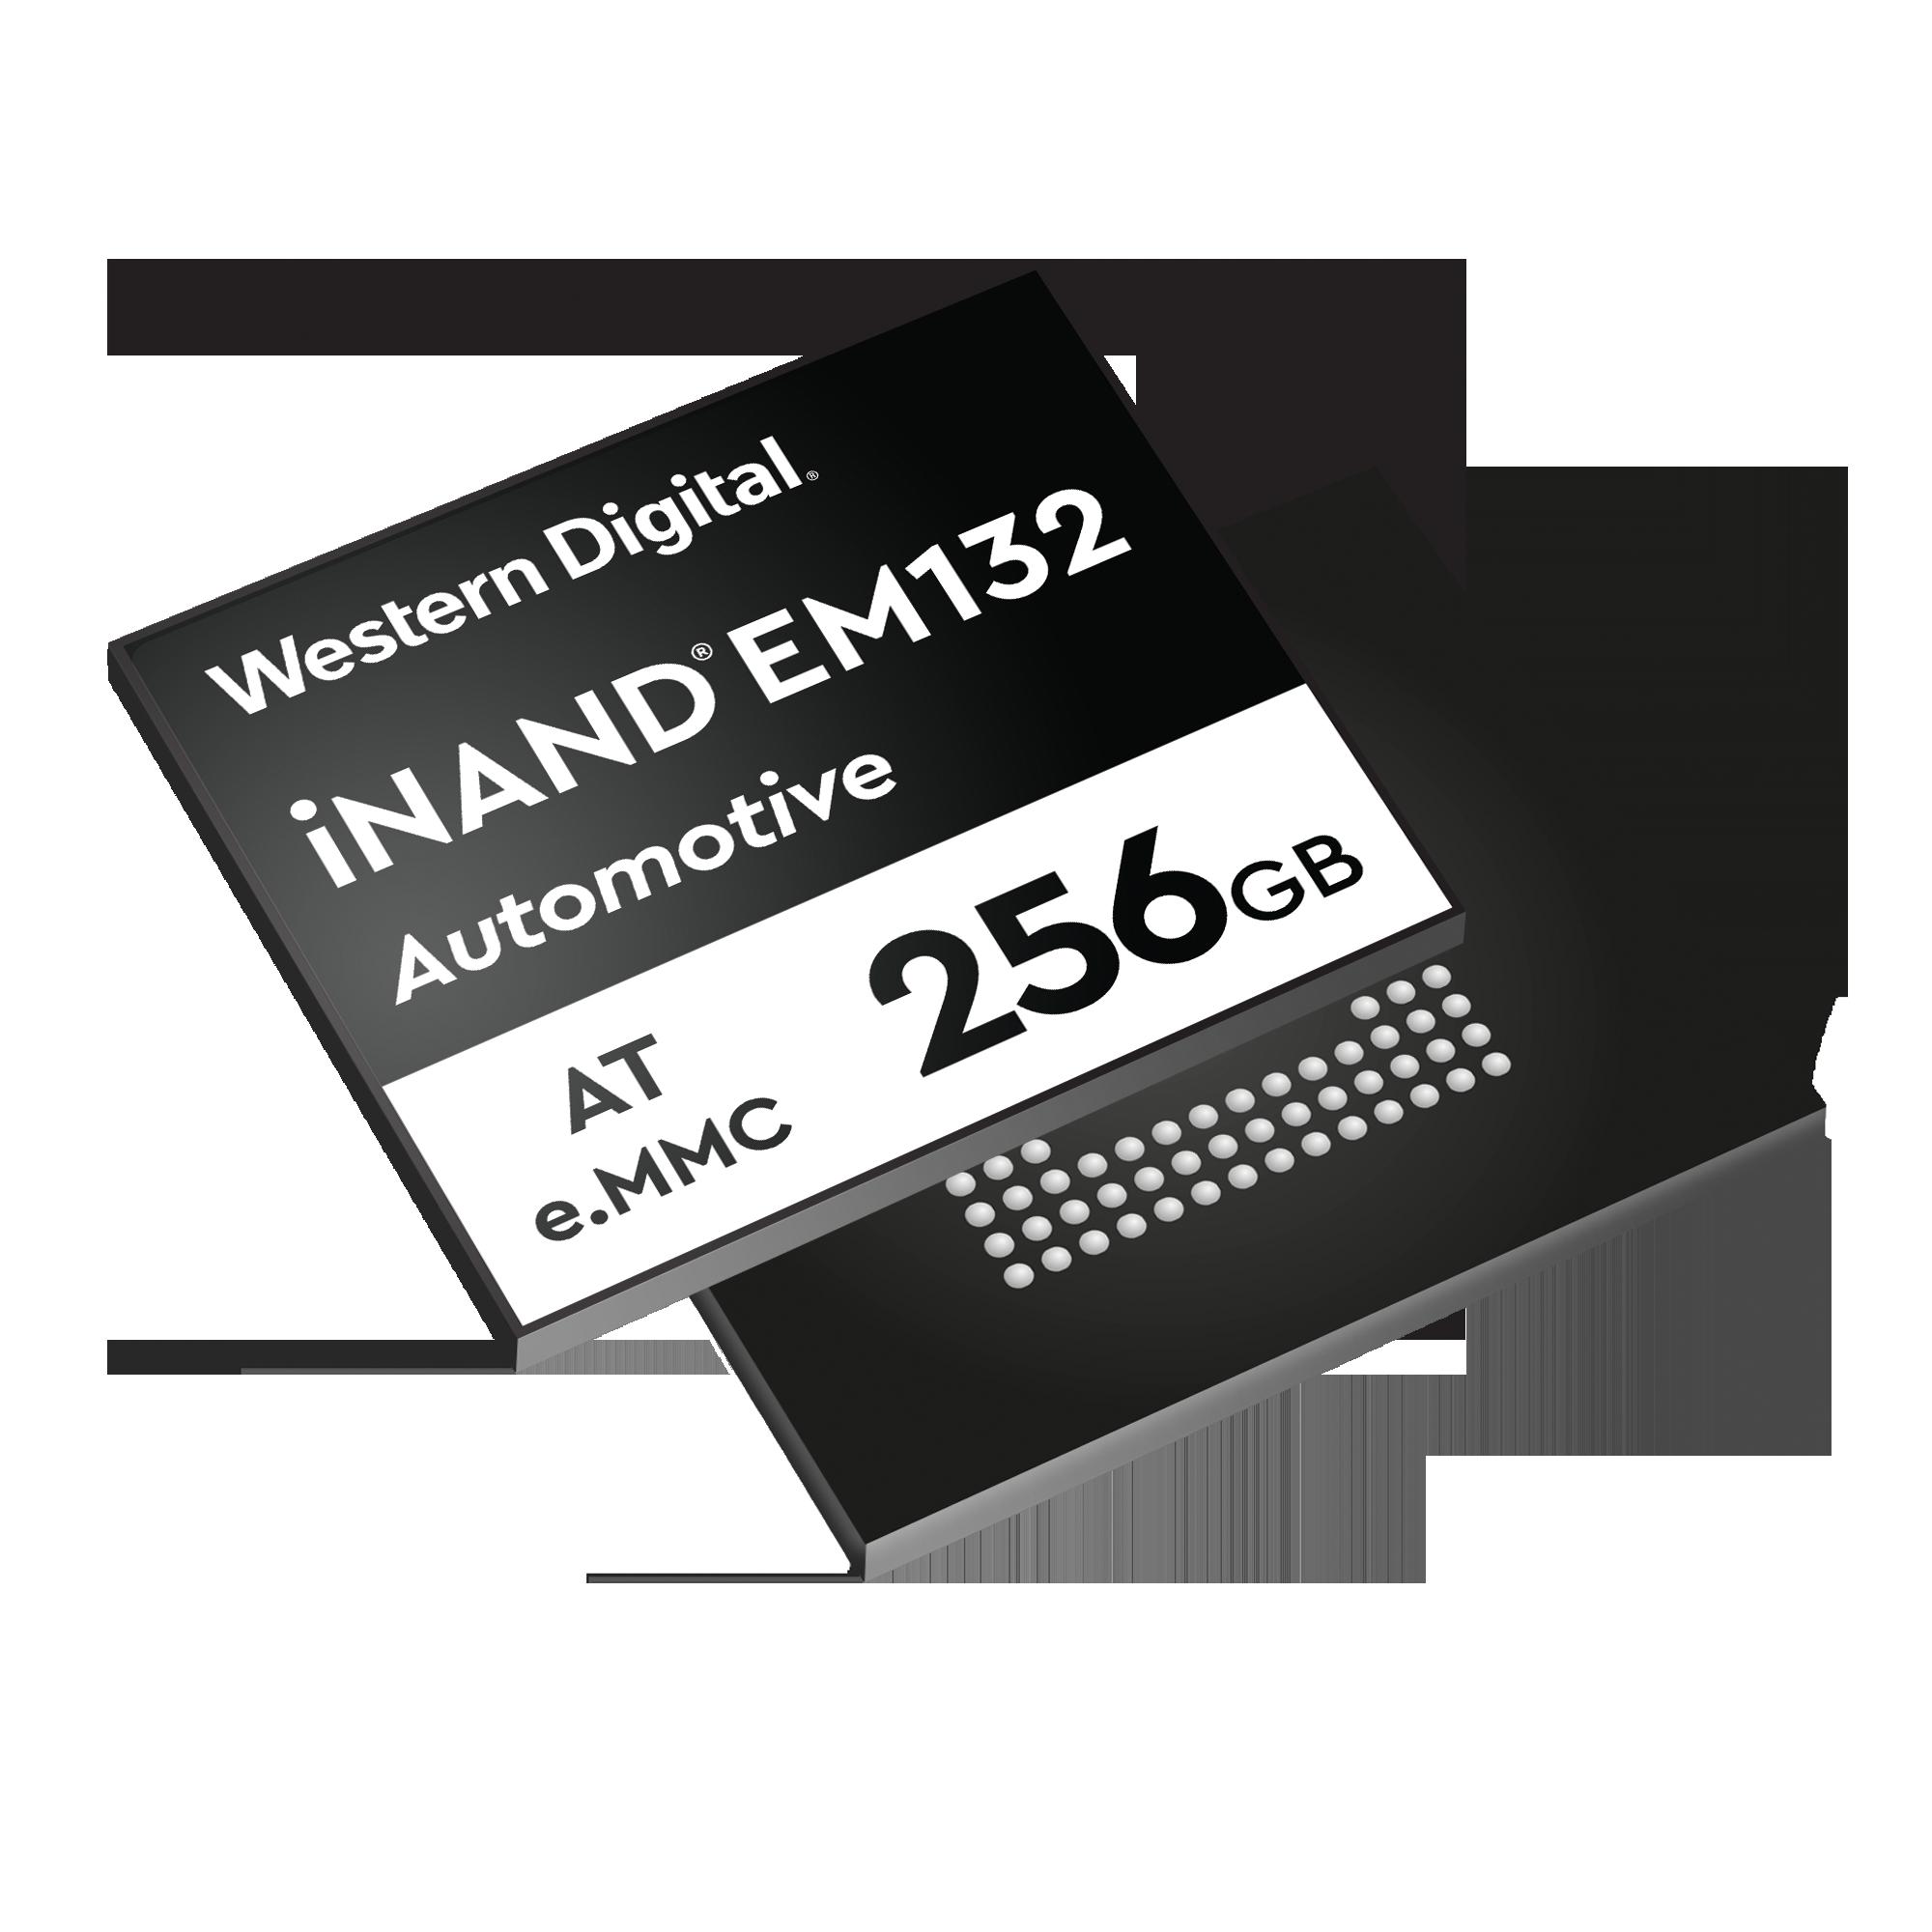 iNAND_EM132_ATeMMC_256GB